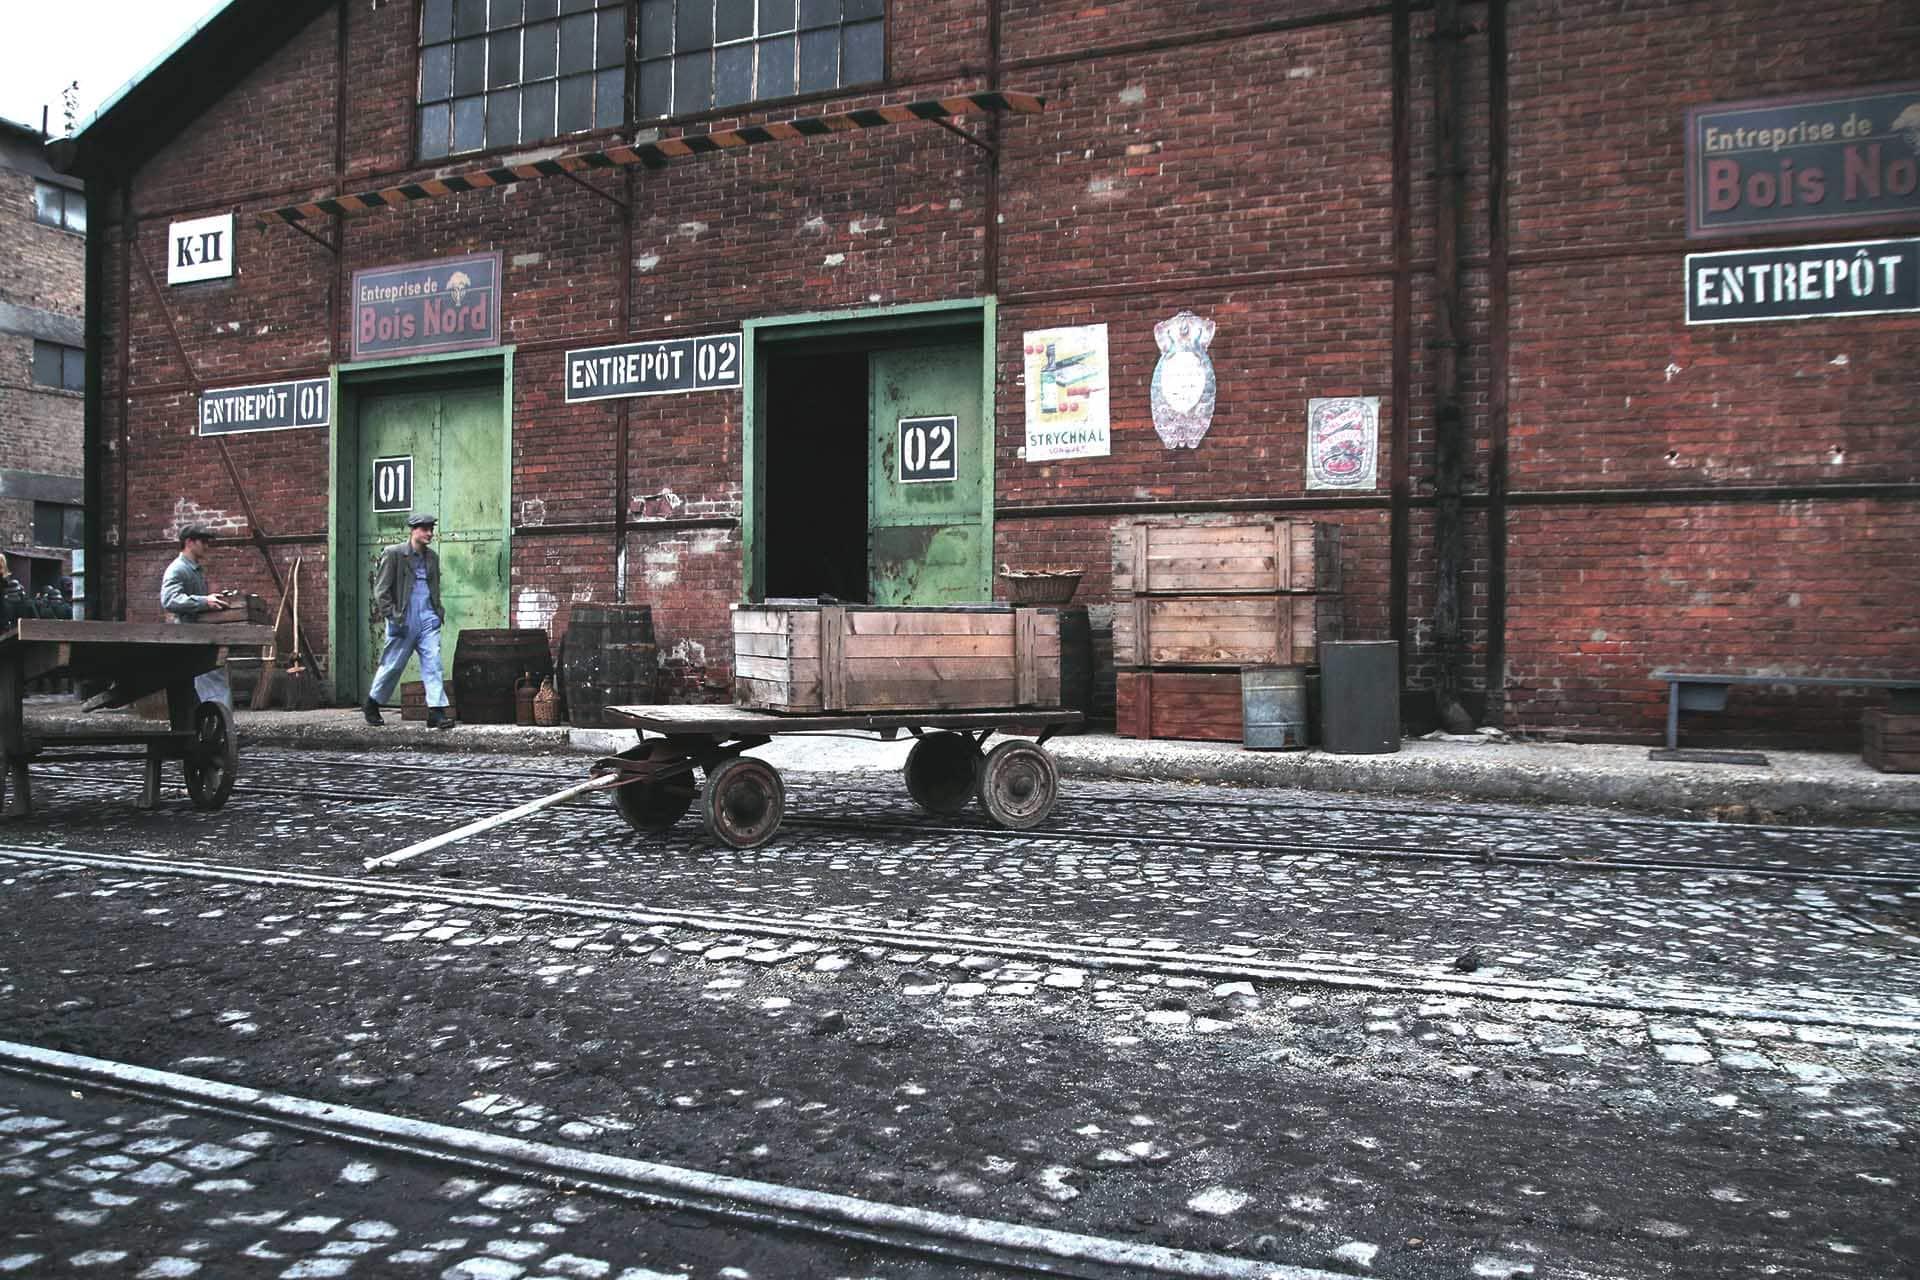 Loading Docks episode 8